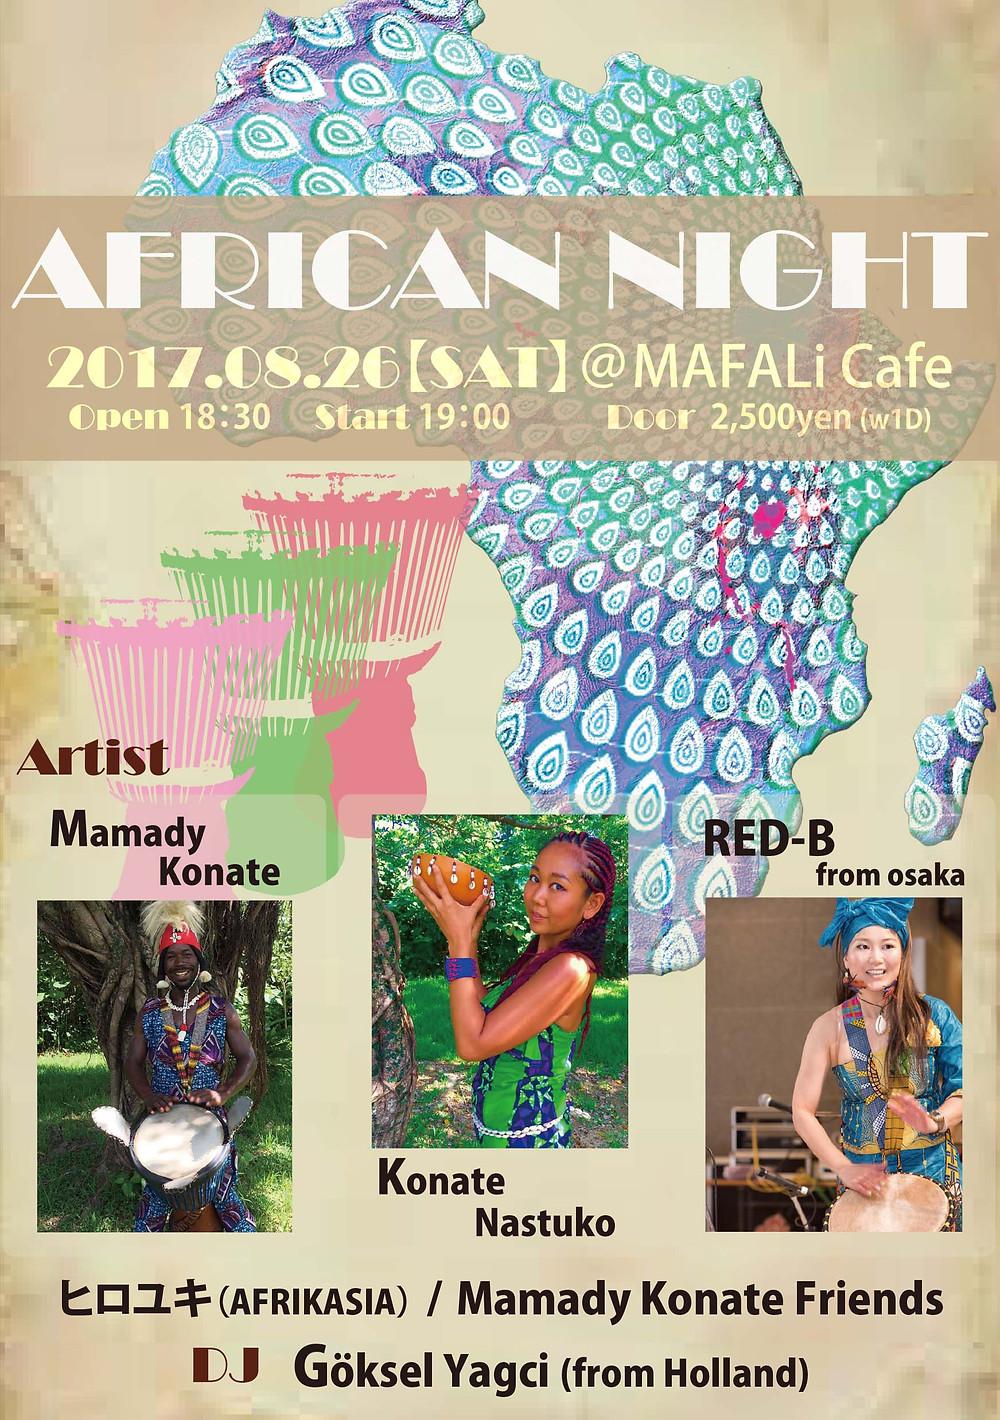 African Night @ Mafali Cafe